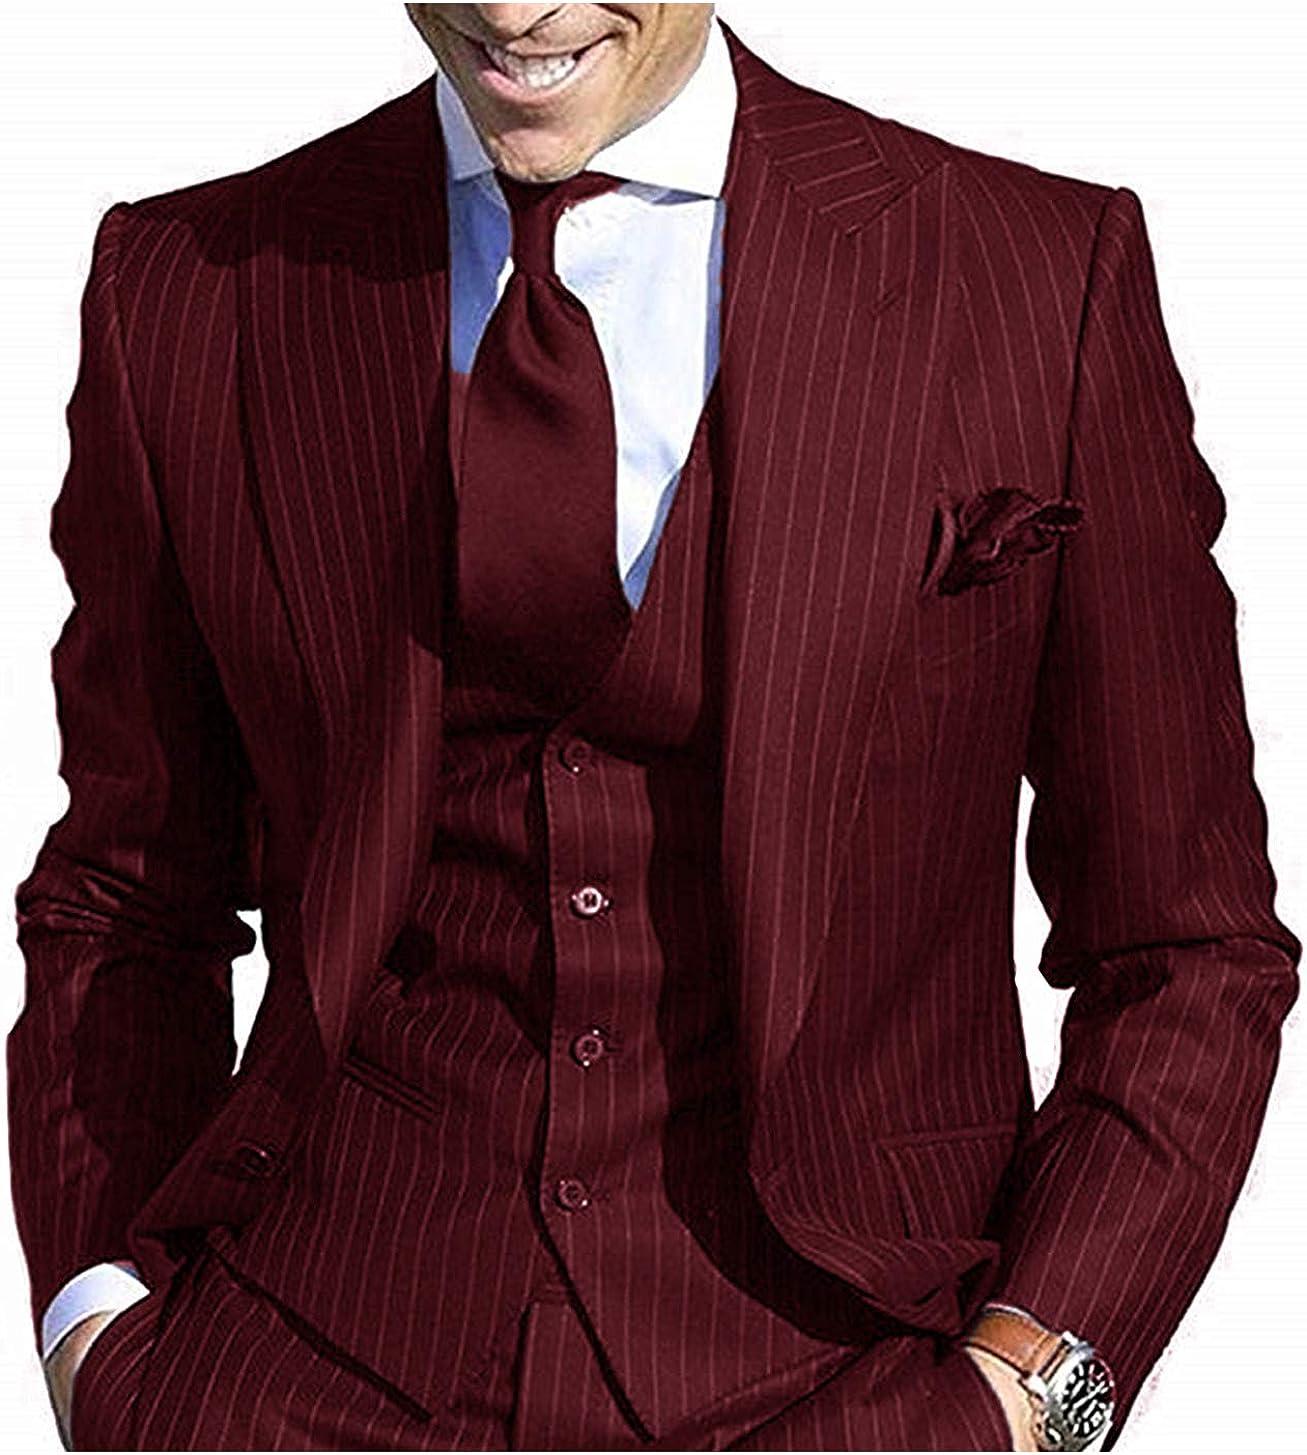 Navy Blue Jackets+Vest+Trousers GBWD Mens Suit Slim Fit Stripe 3 ...